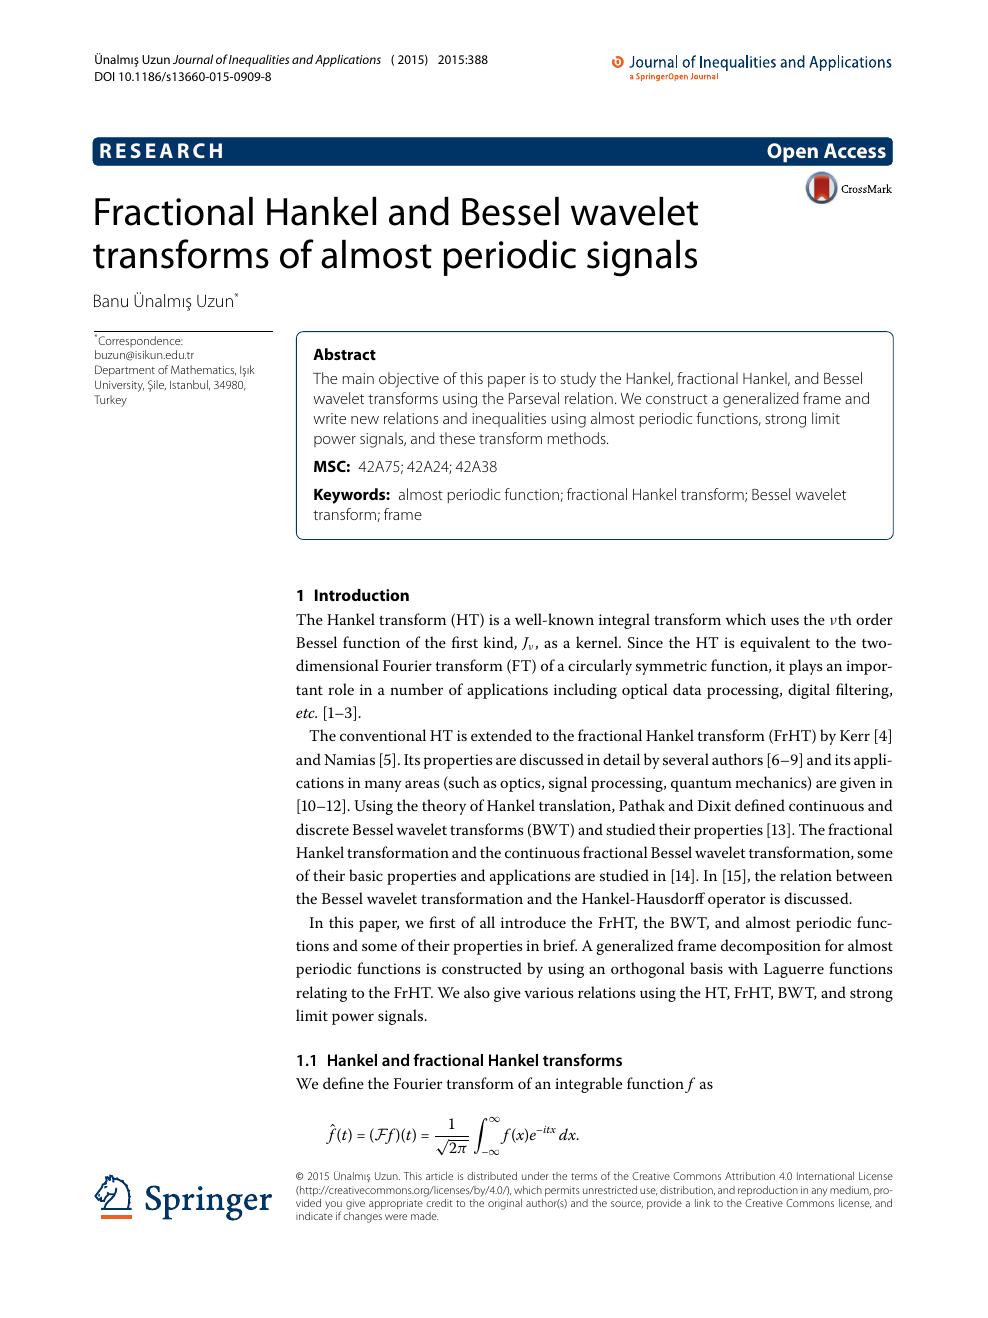 Fractional Hankel and Bessel wavelet transforms of almost